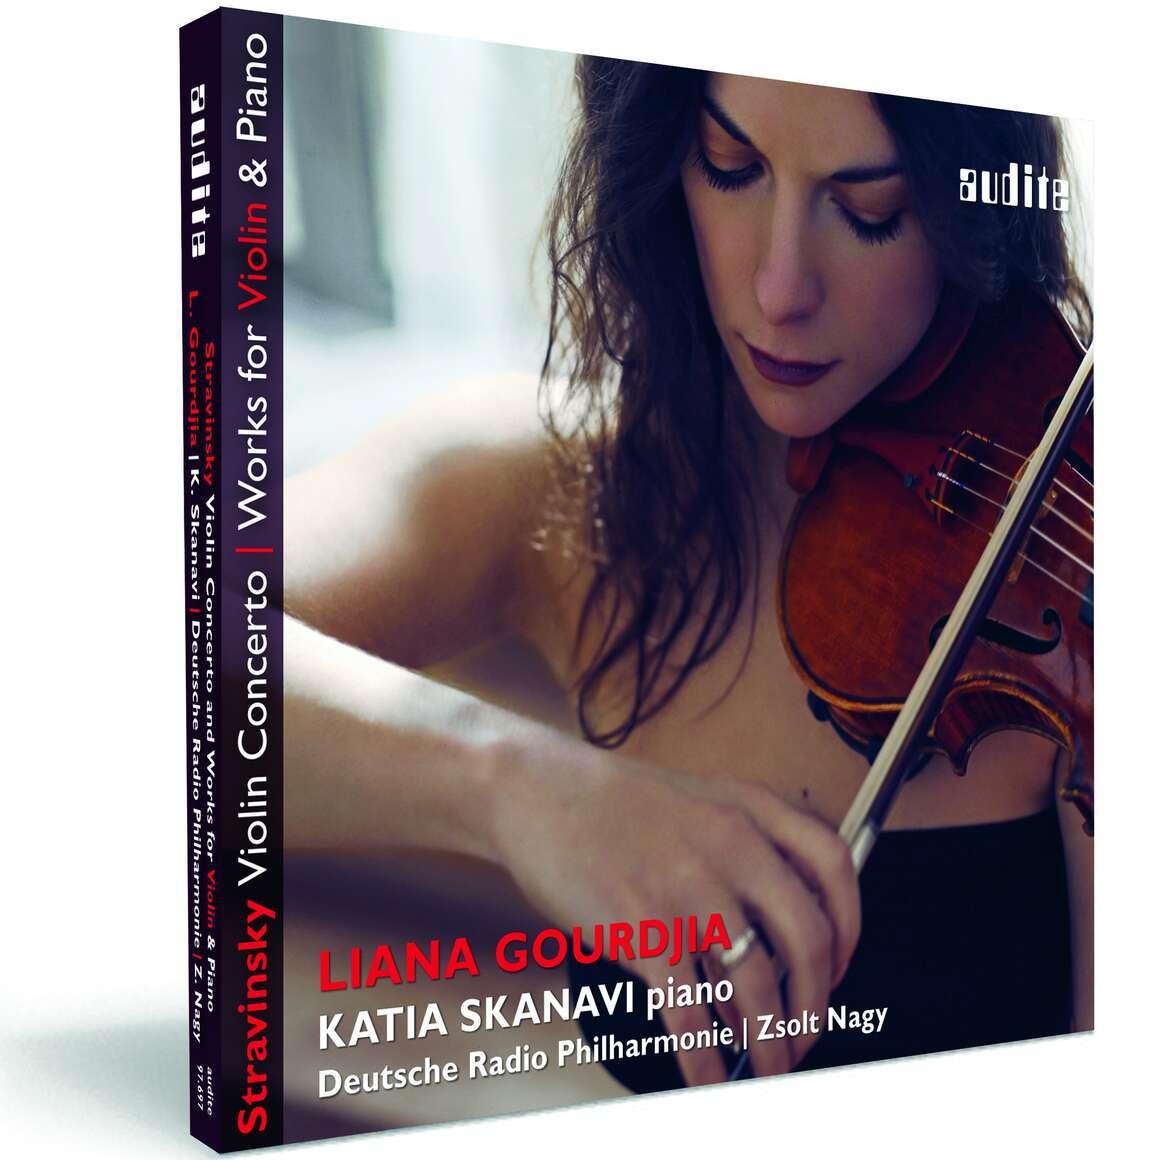 Stravinsky: Works for Violin